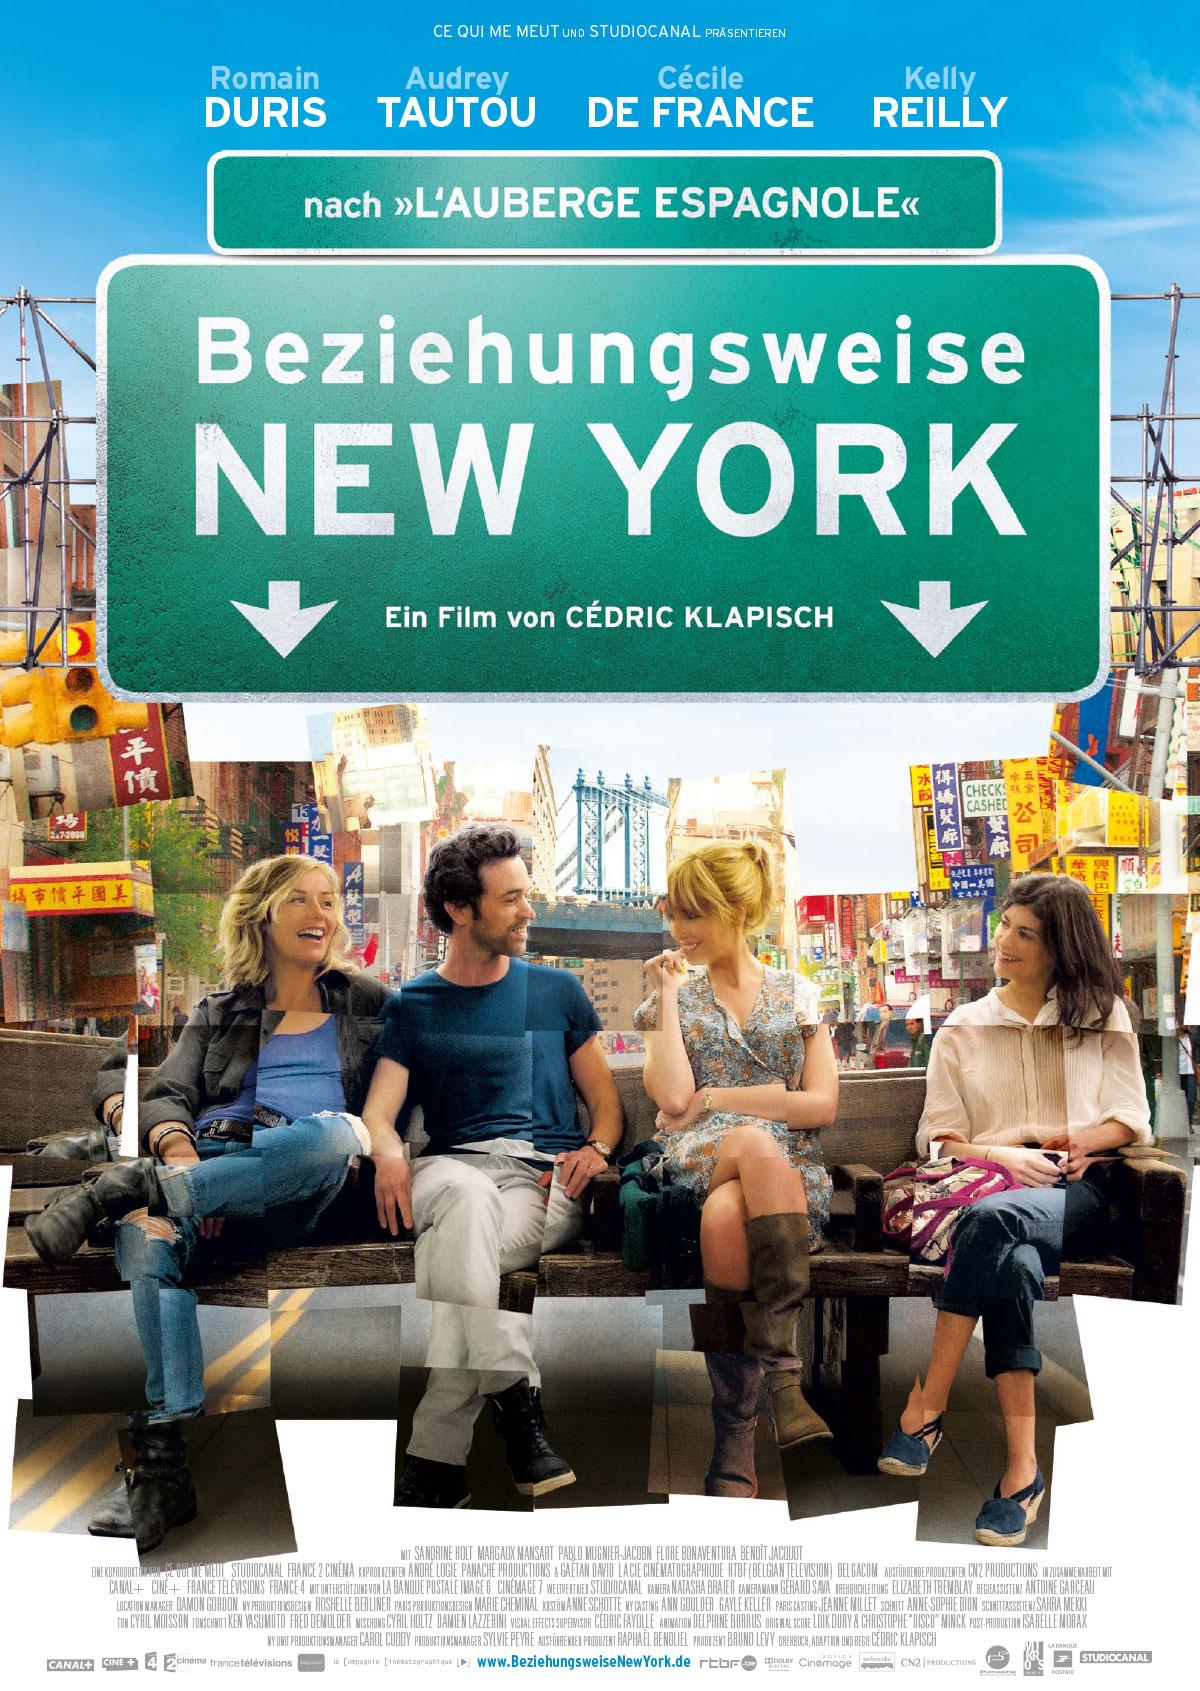 Beziehungsweise New York Film Studiocanal